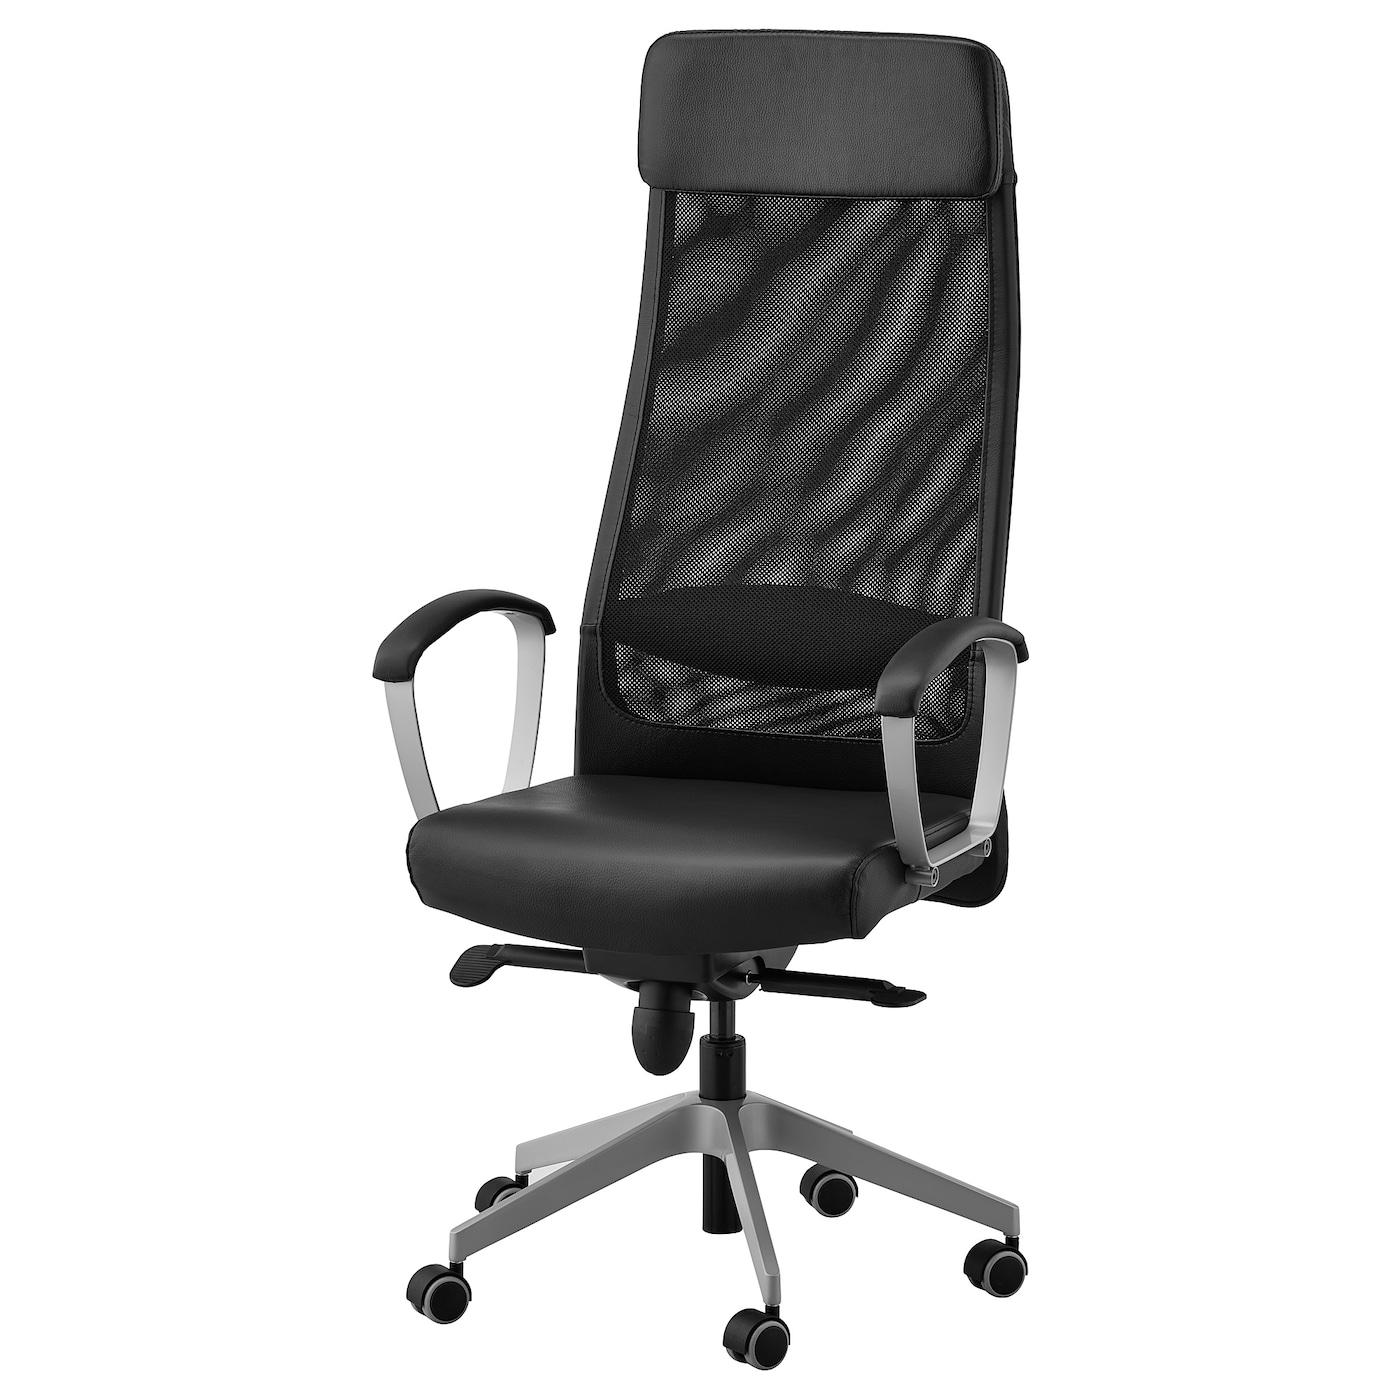 MARKUS Office chair - Glose black